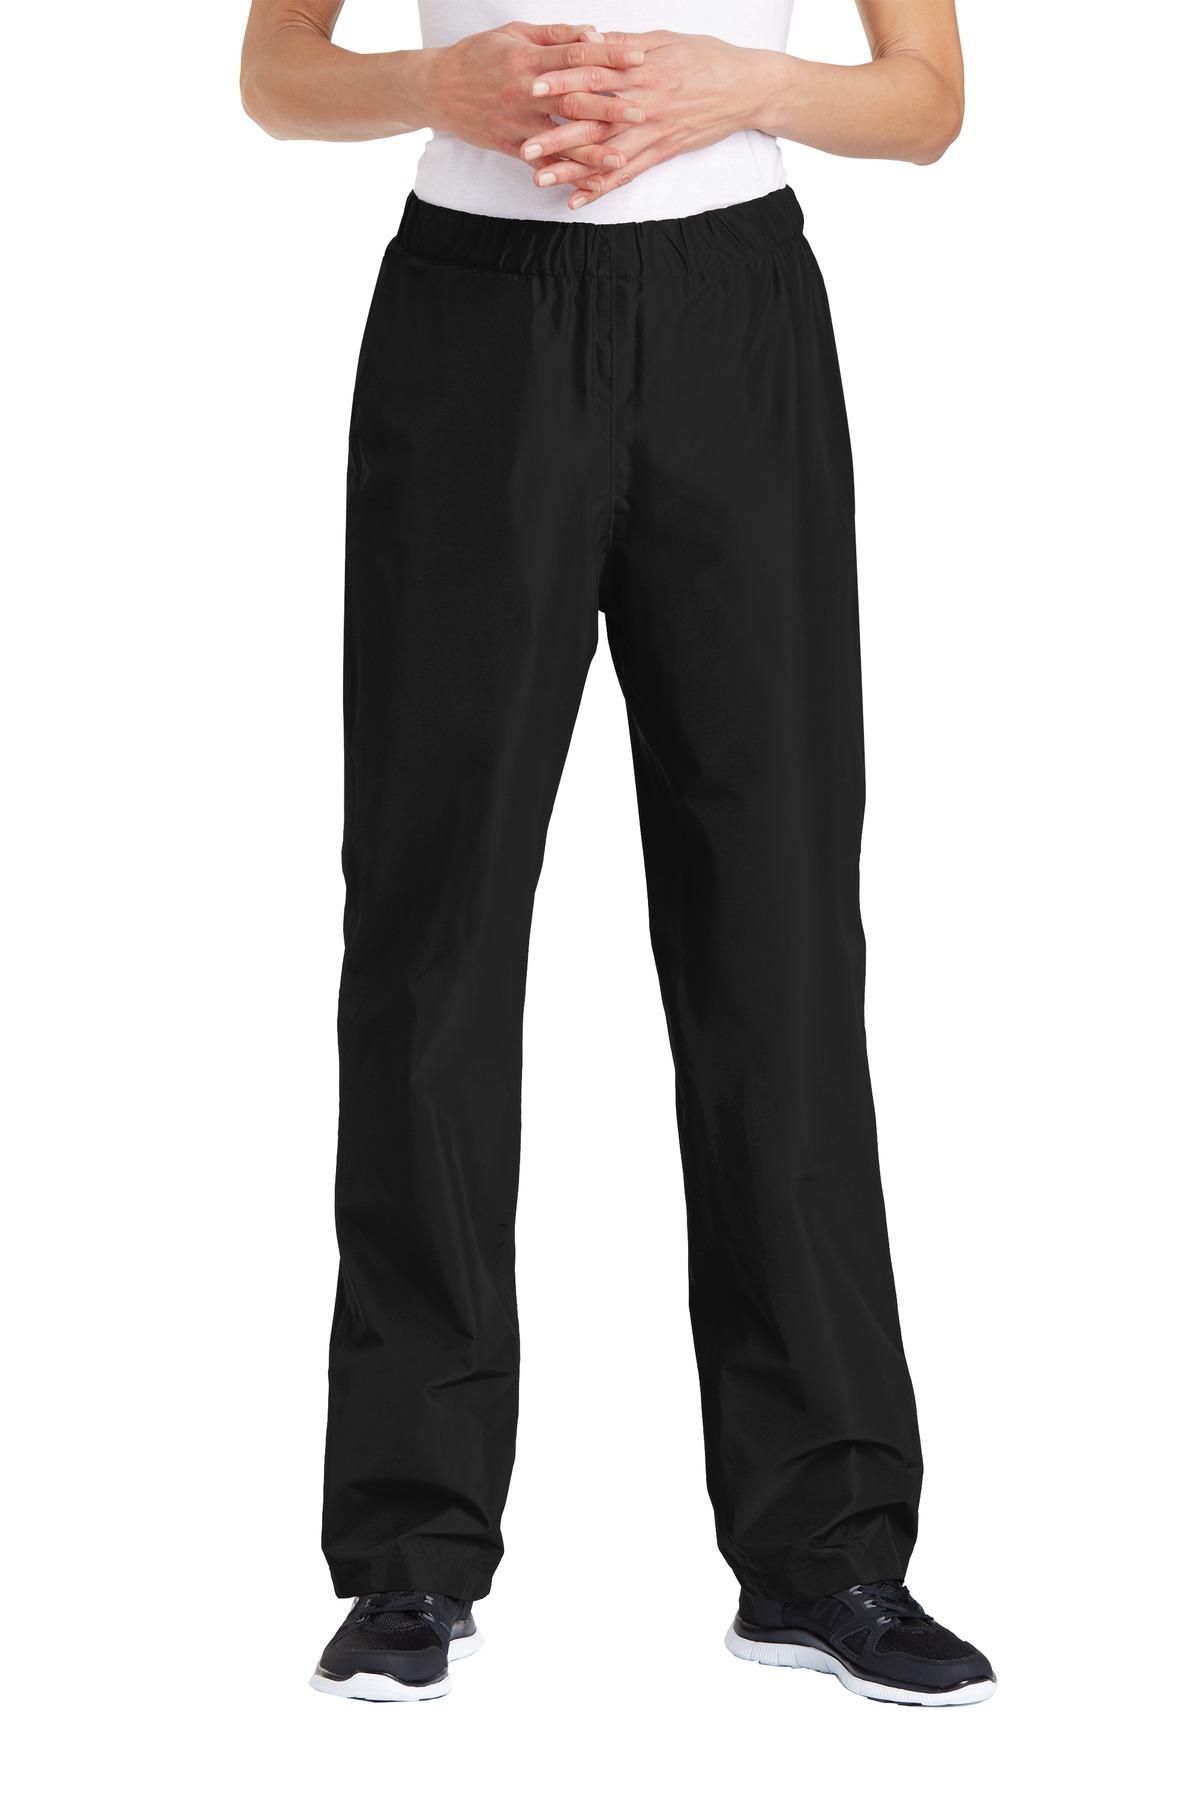 Port Authority  LPT333 - Ladies Torrent Waterproof Pant